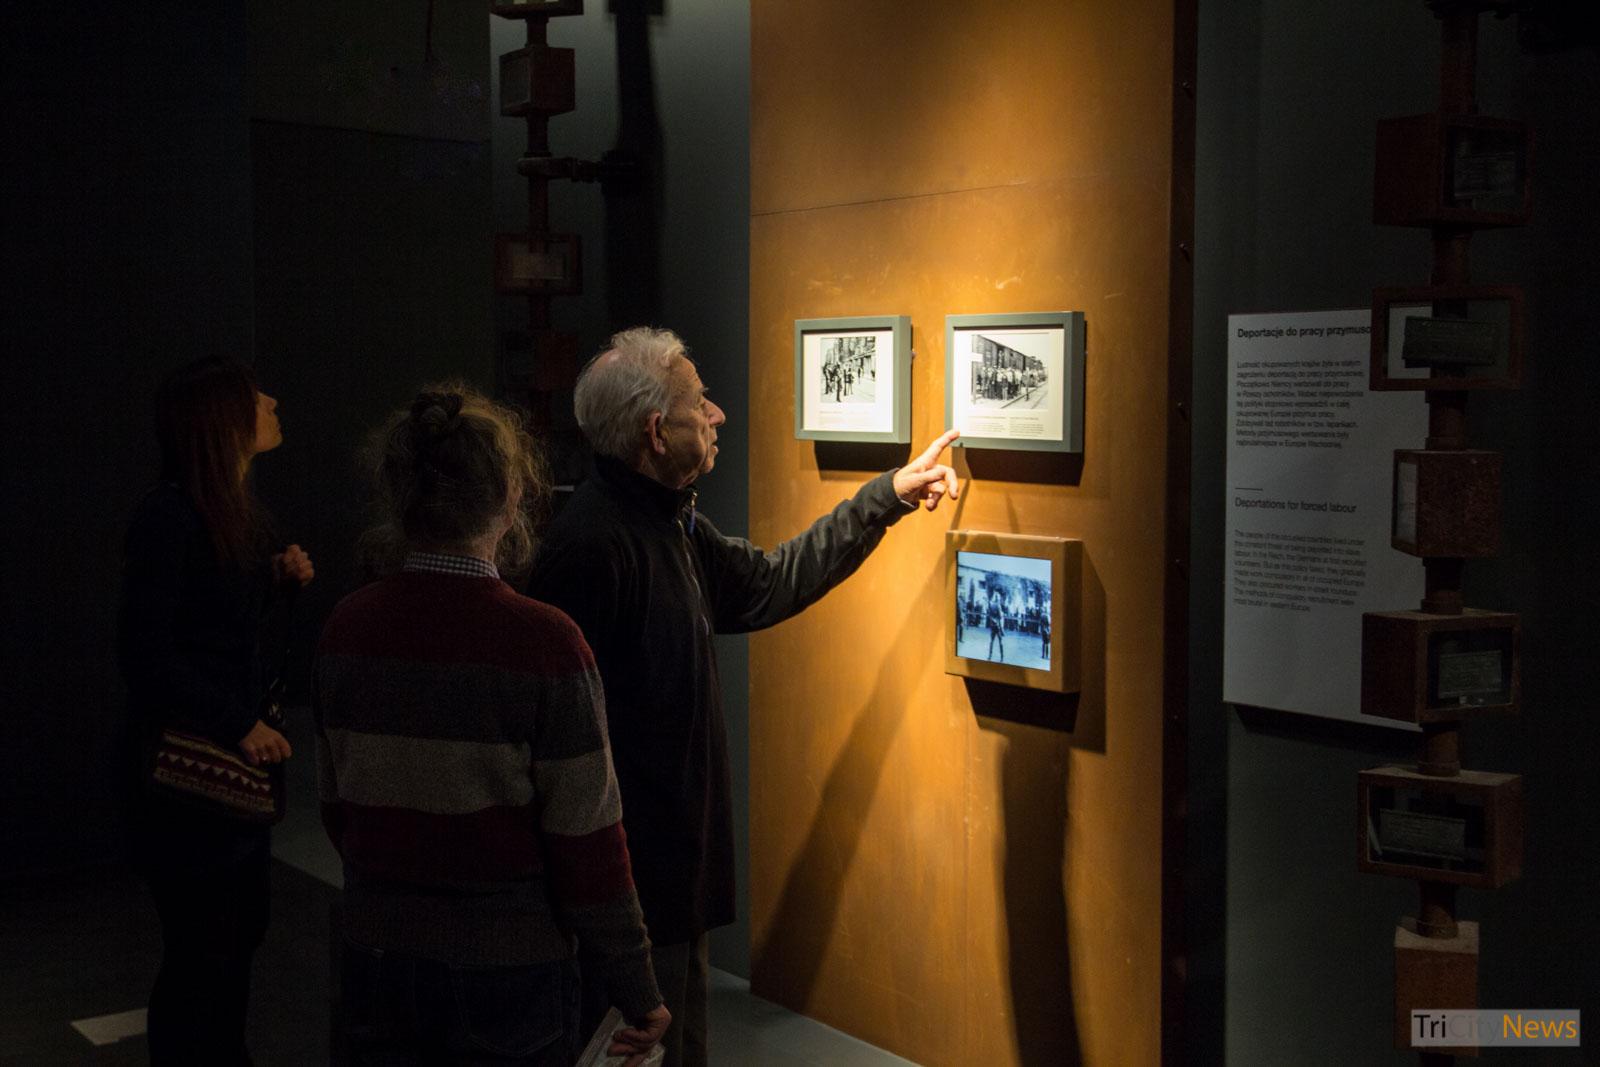 Long Night of Museums, Photo: Jakub Woźniak/Tricity News